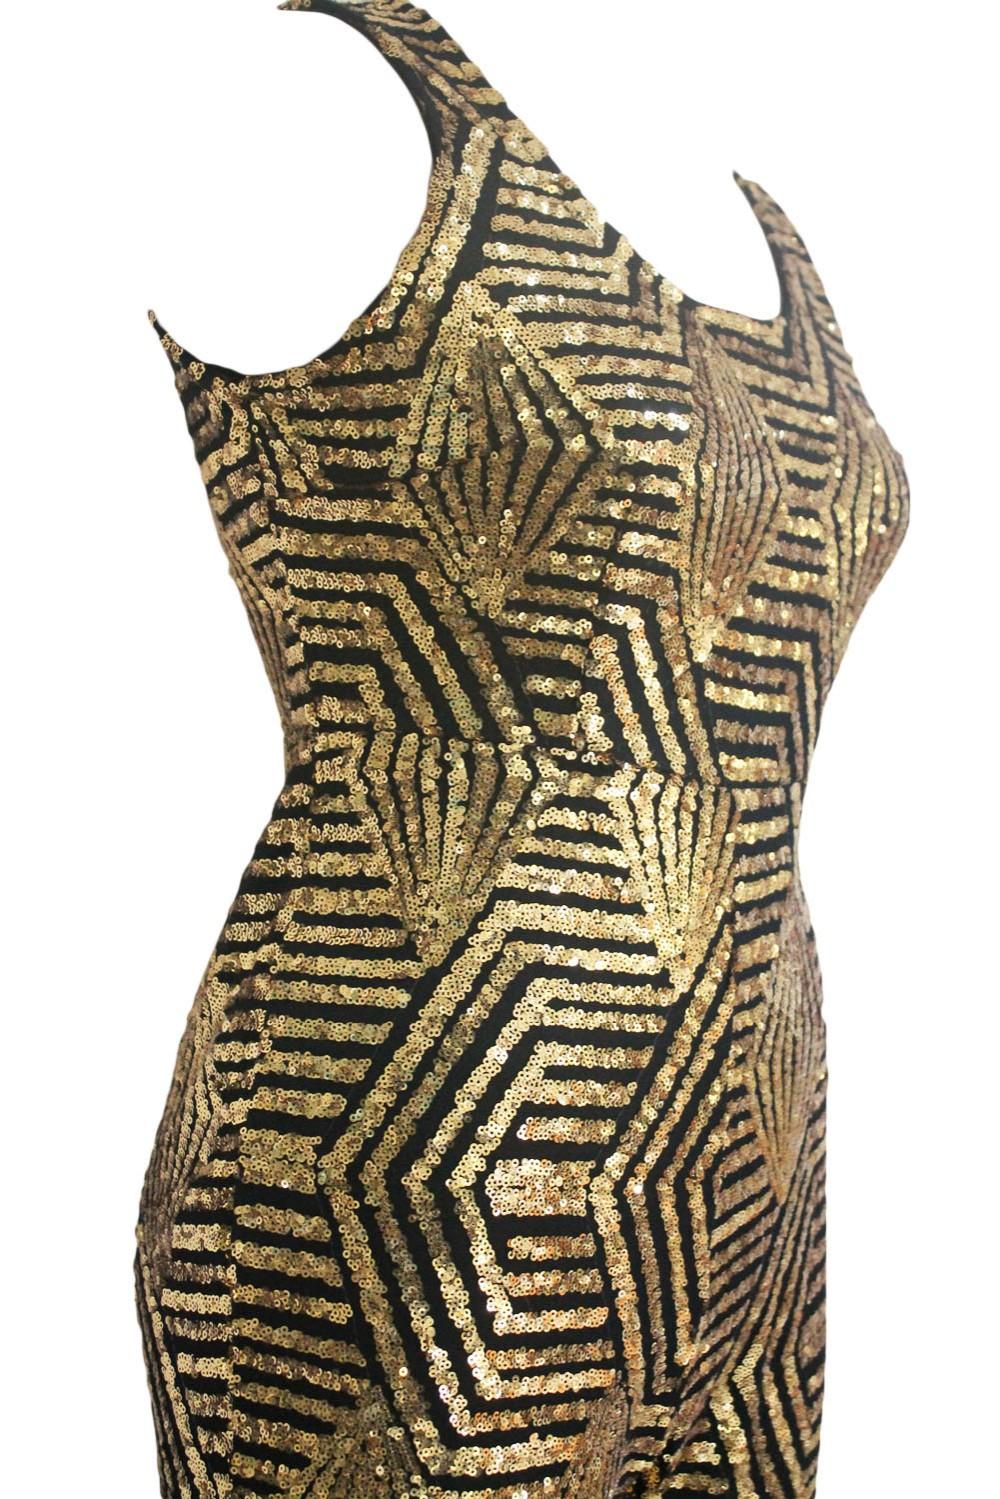 1775cbee4e Dear Lover sexy jumpsuit 2016 summer short sleeve Classic Colorblock Solid  Black Back Romper Women s Shorts Bodysuits LC64063USD 25.66 piece